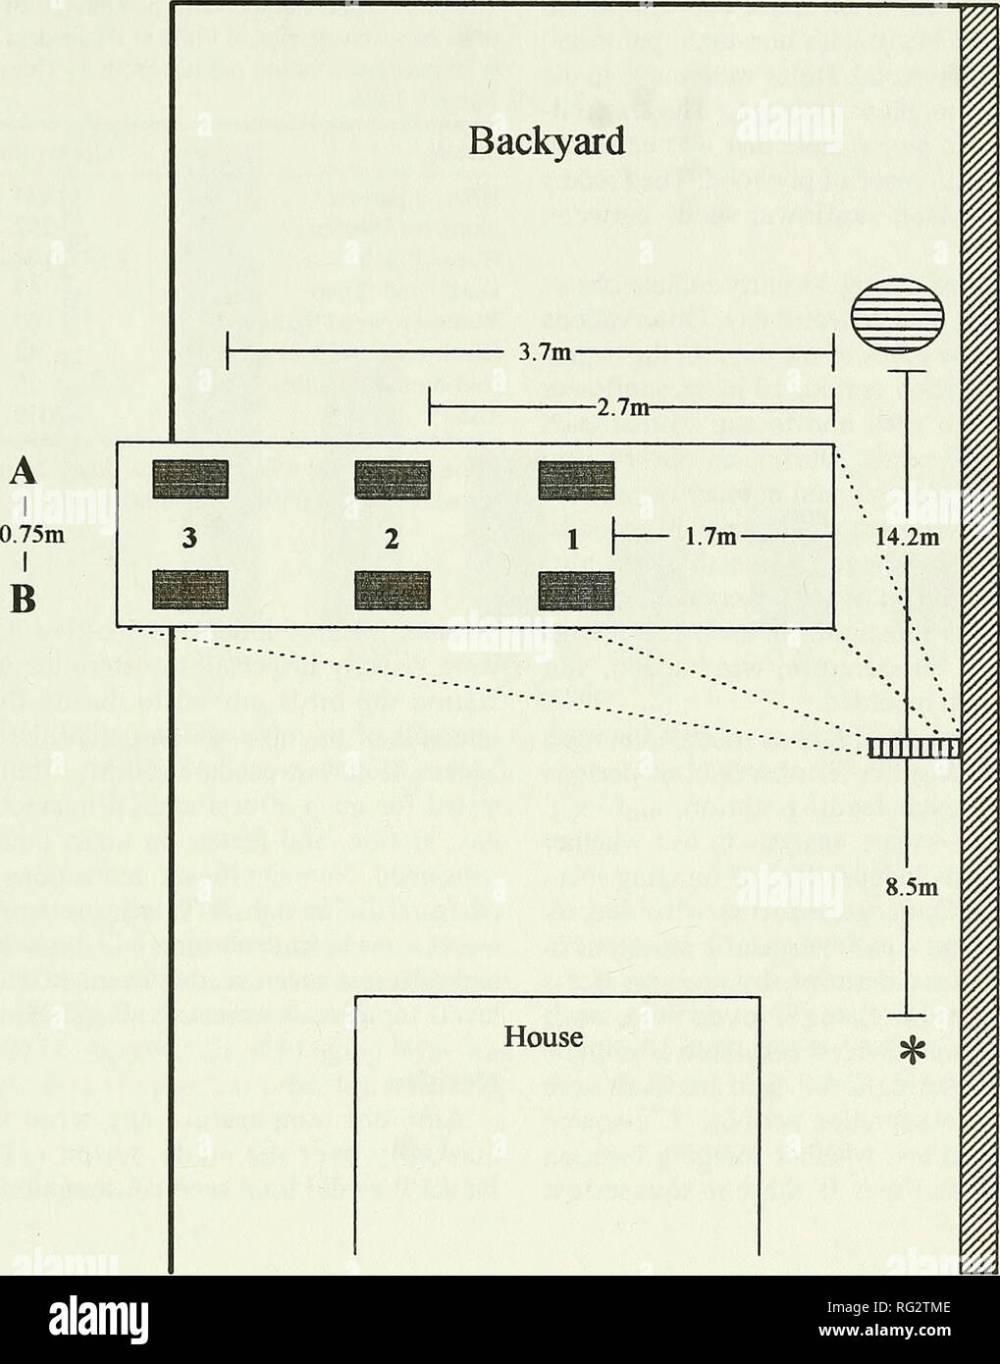 medium resolution of cedar hedge table w bird feeders maple tree fence q muffin tin h observer figure 1 diagram of stxidy location